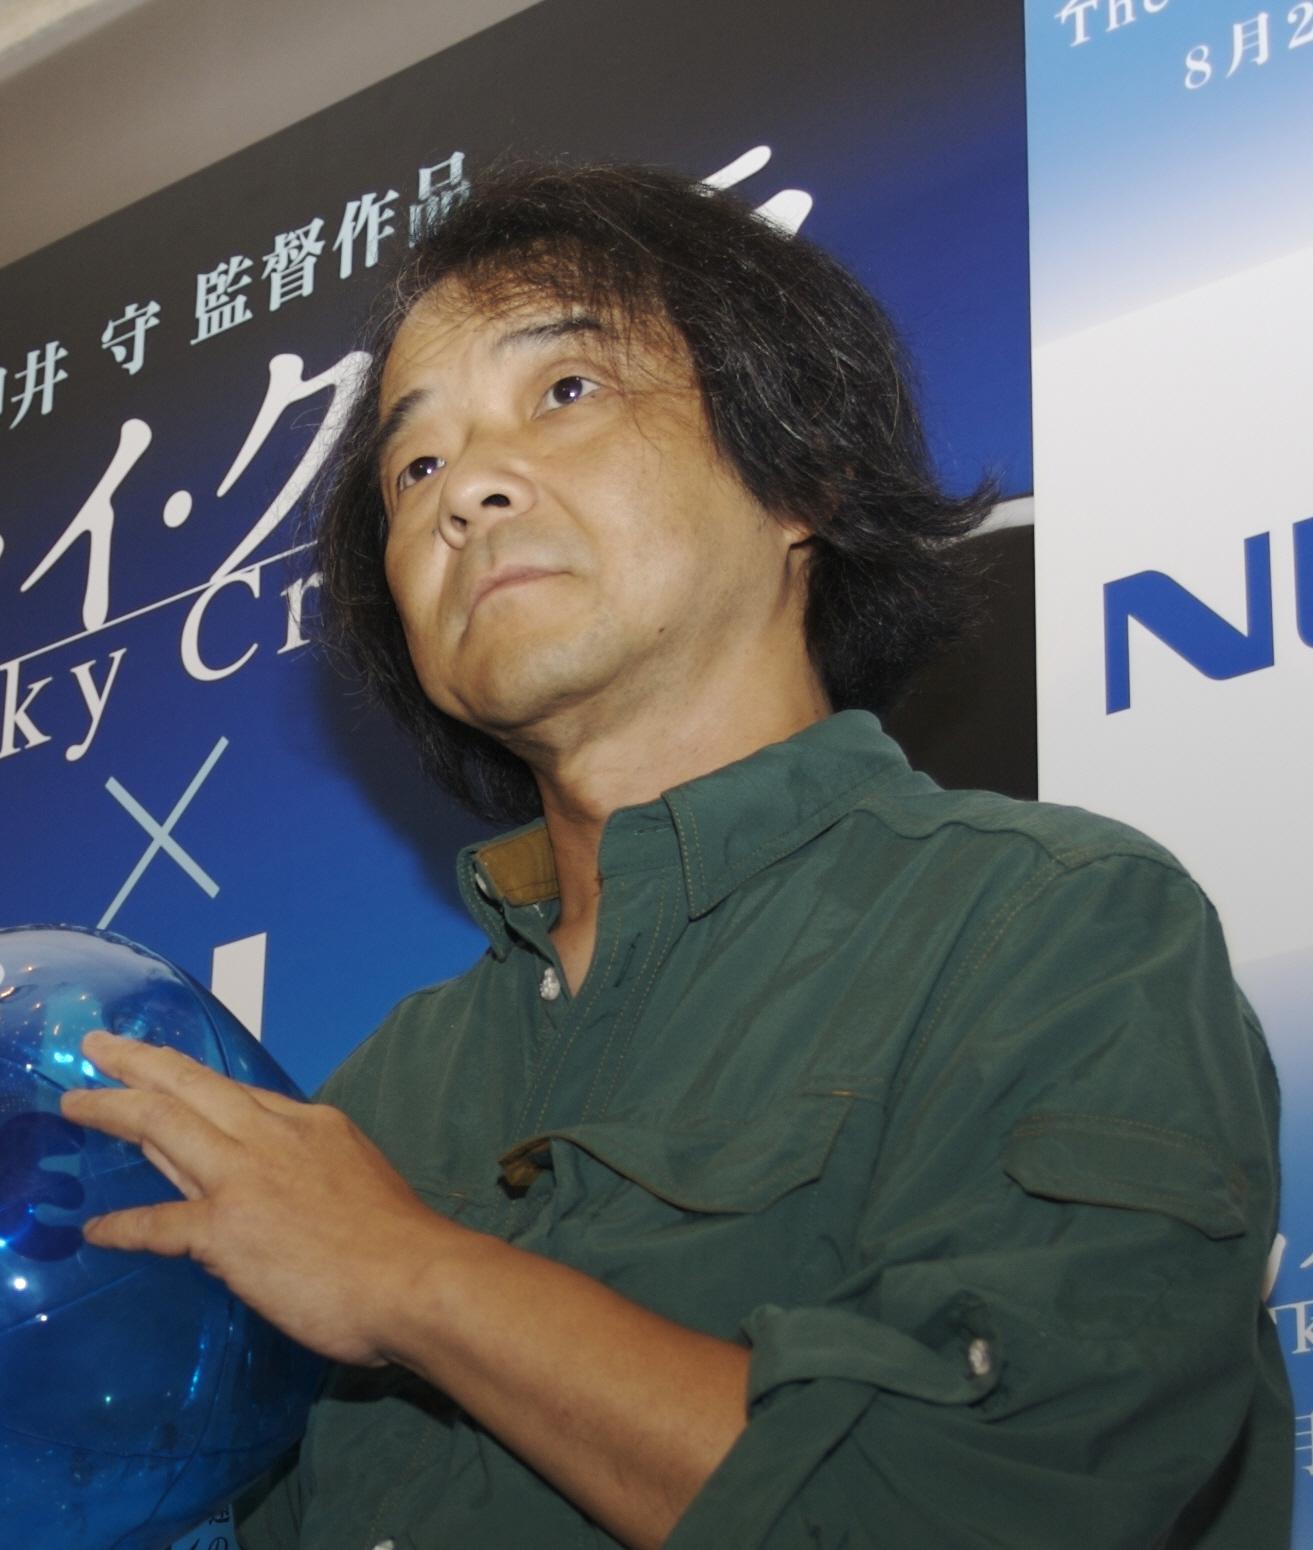 http://upload.wikimedia.org/wikipedia/commons/f/f8/Mamoru_Oshii%28in_2008%29.jpg